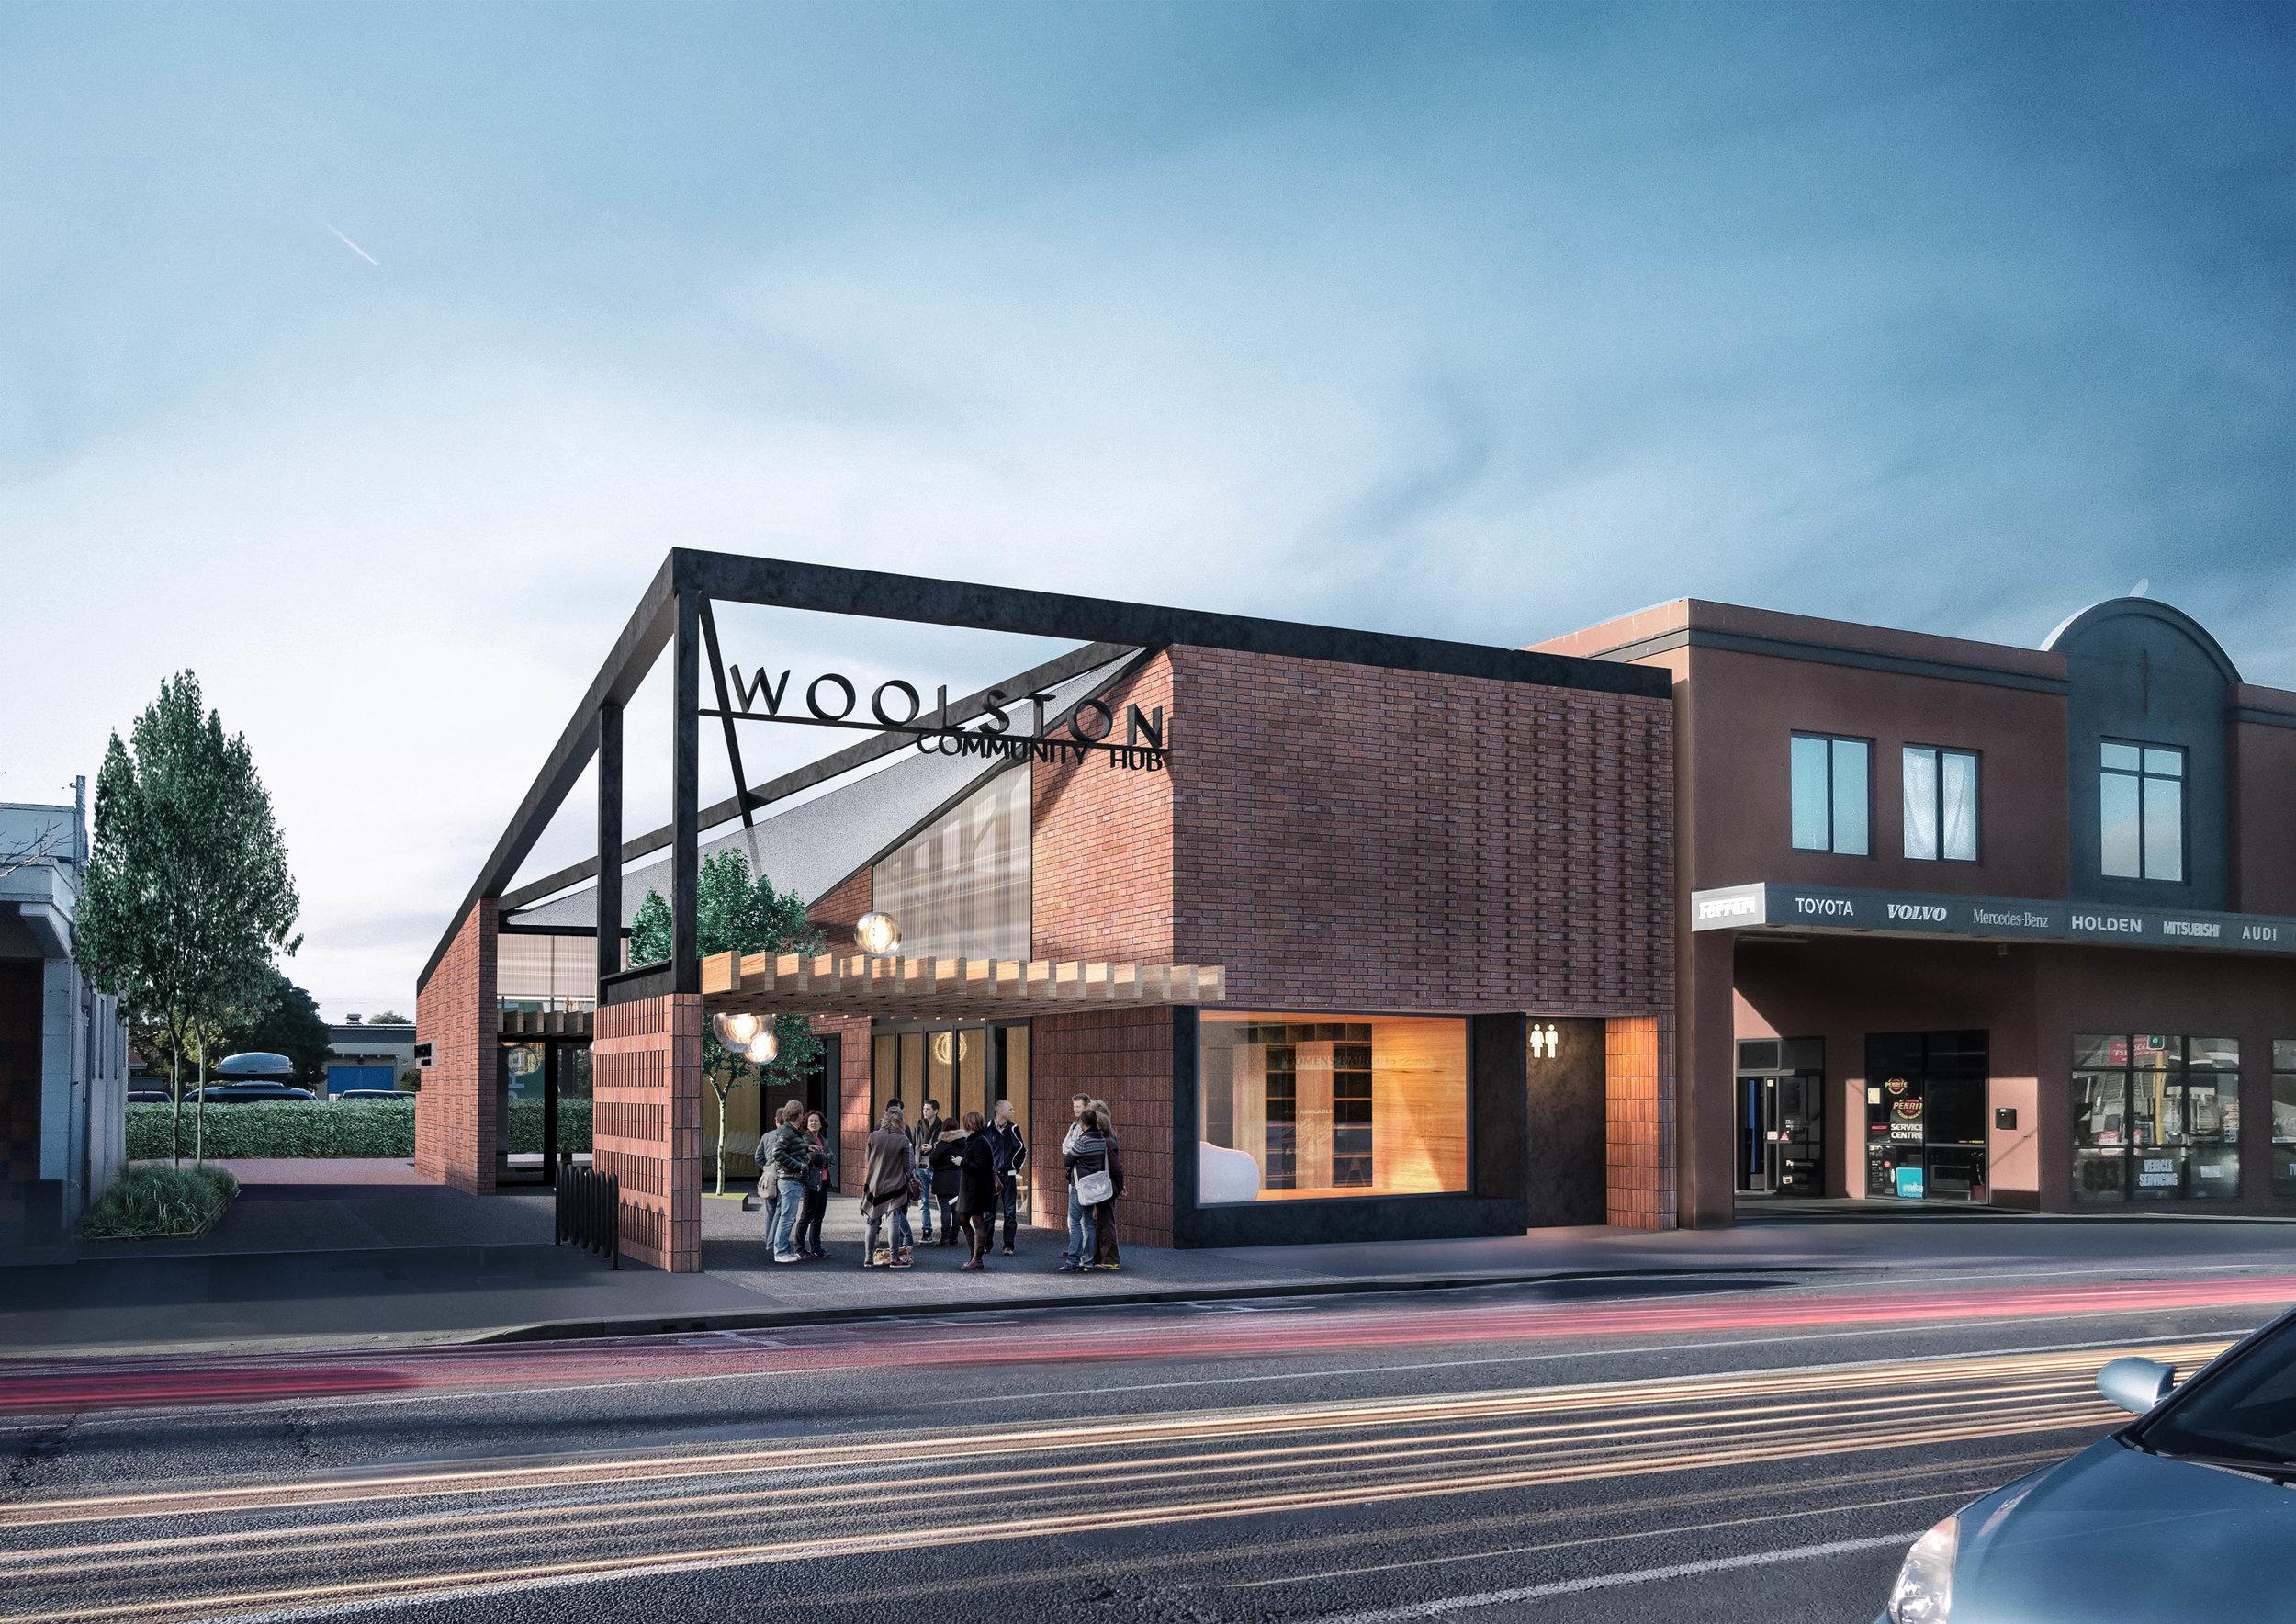 Woolston Community Hub